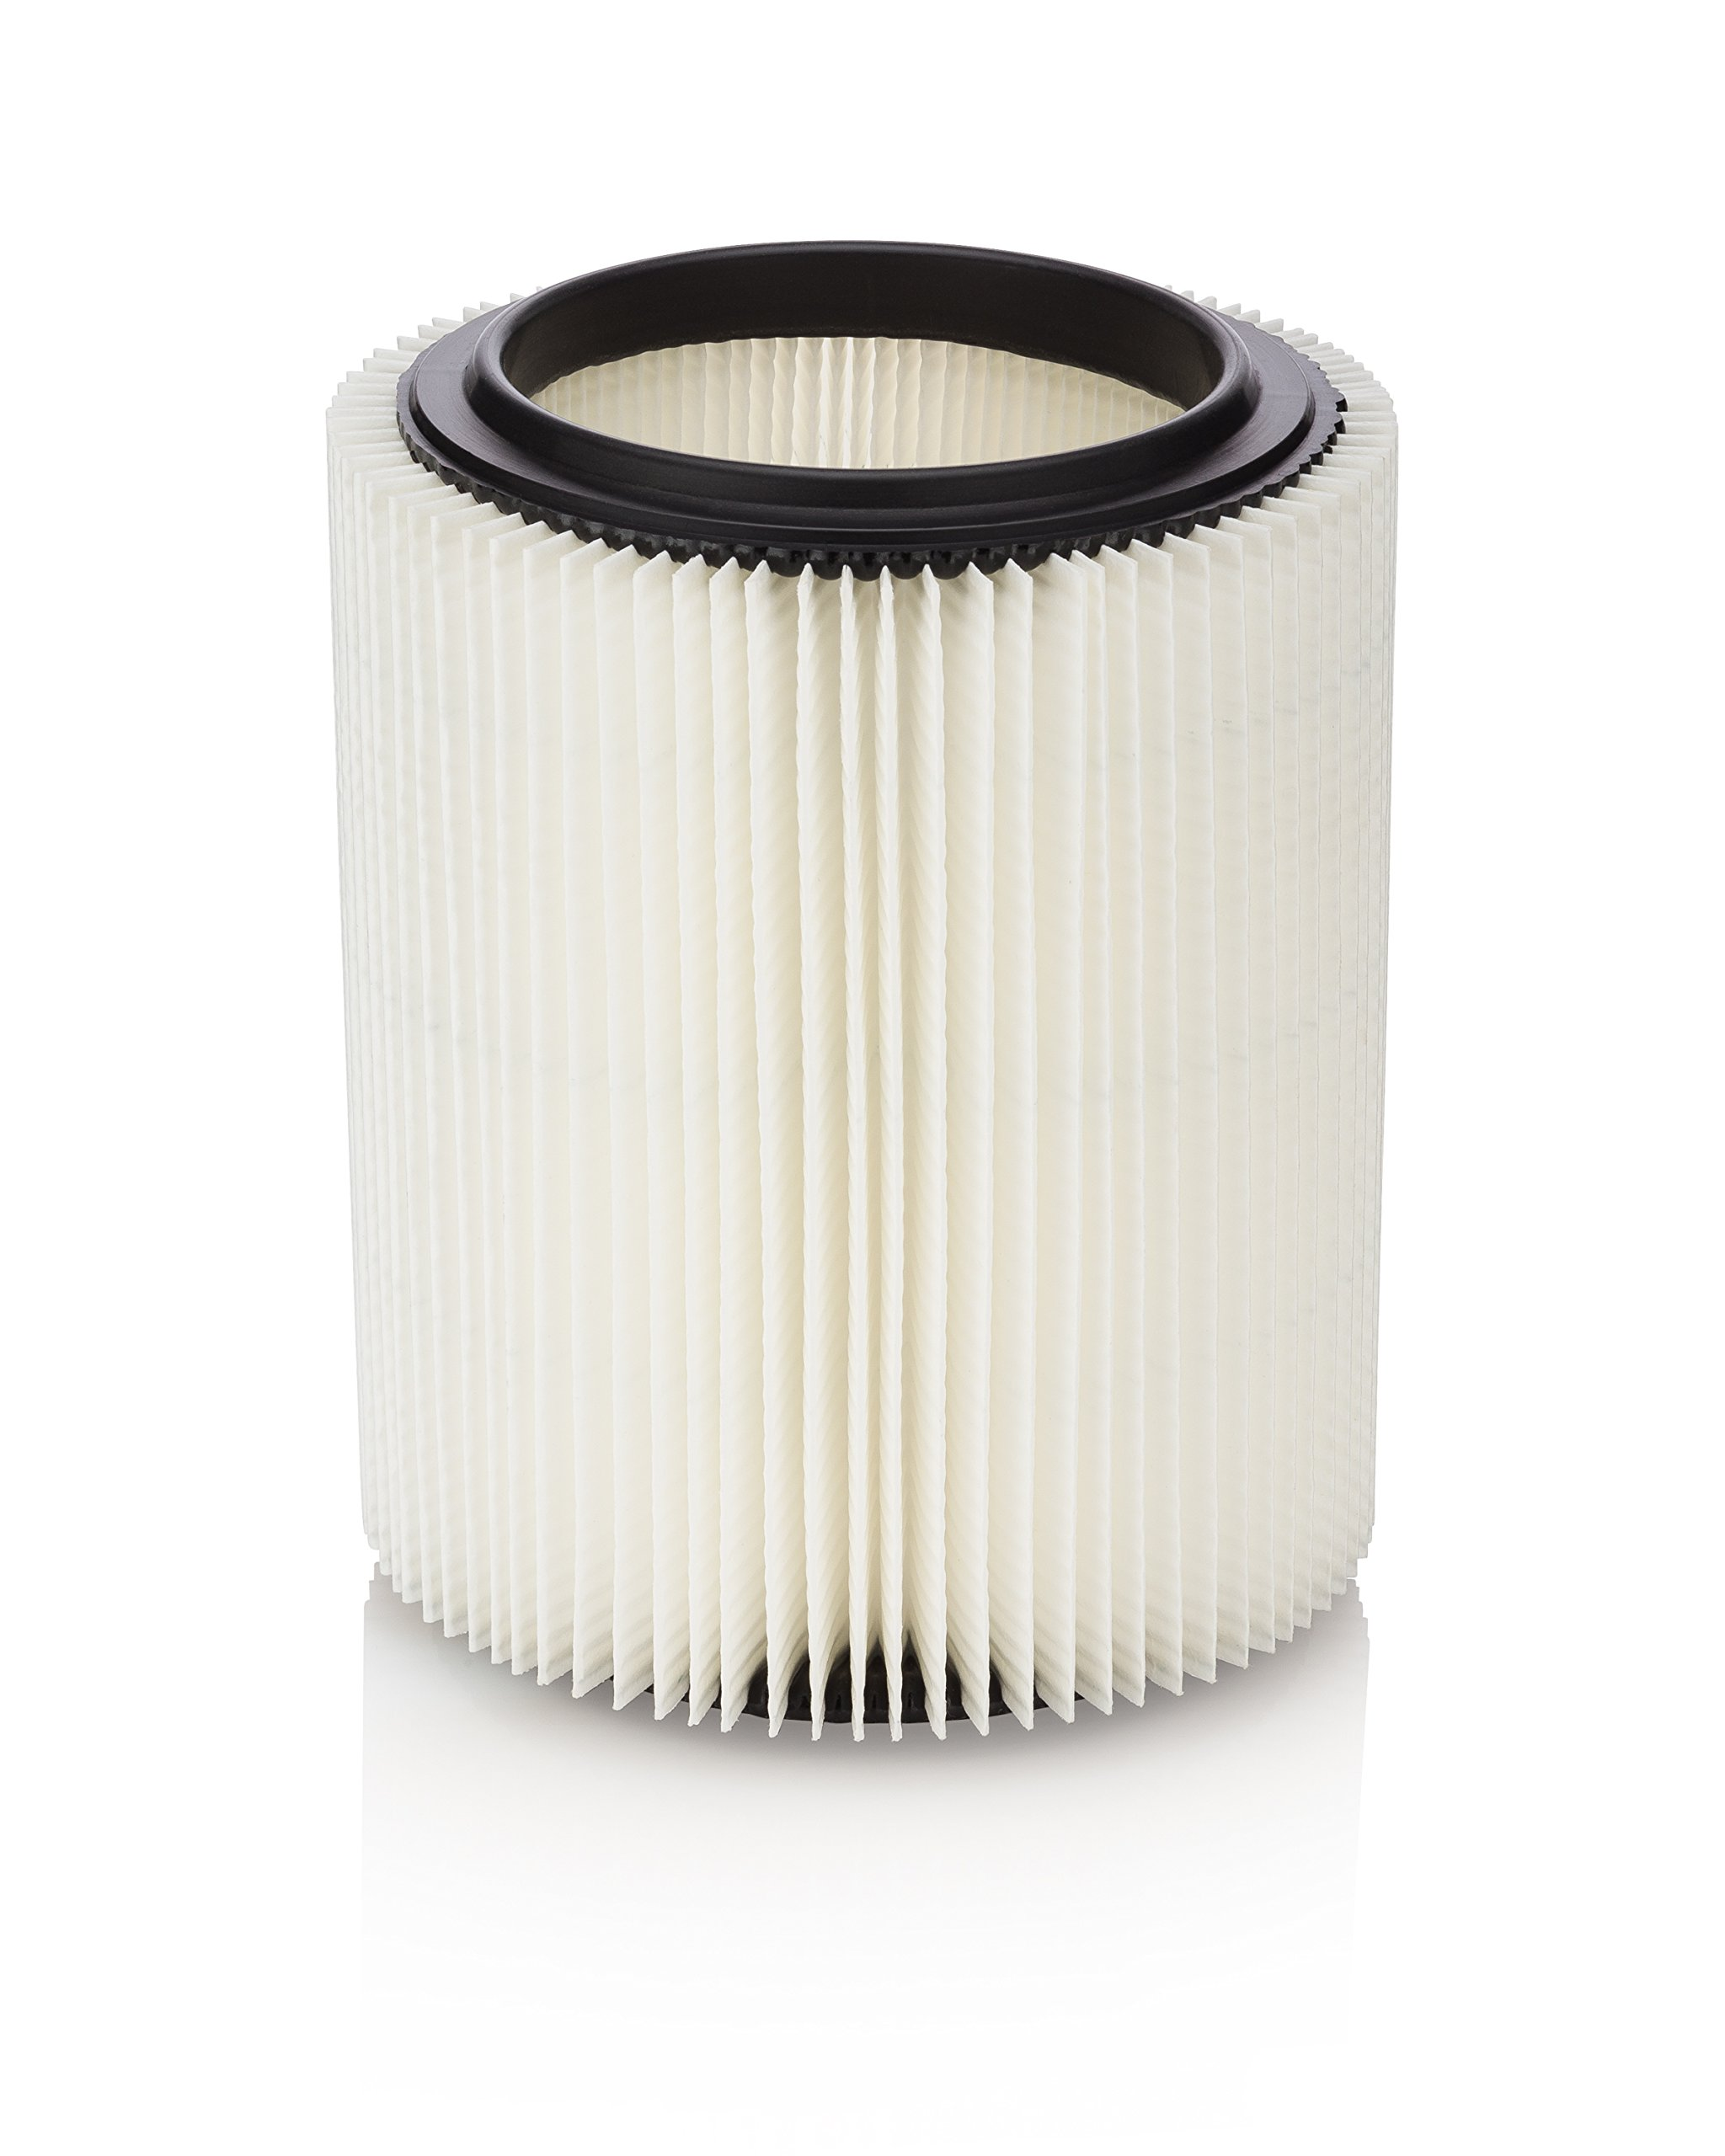 Kopach Replacement Filter for Craftsman and Ridgid Shop Vacs Part # 9-17816 & Part # VF4000, 20 Pack, Original Filter